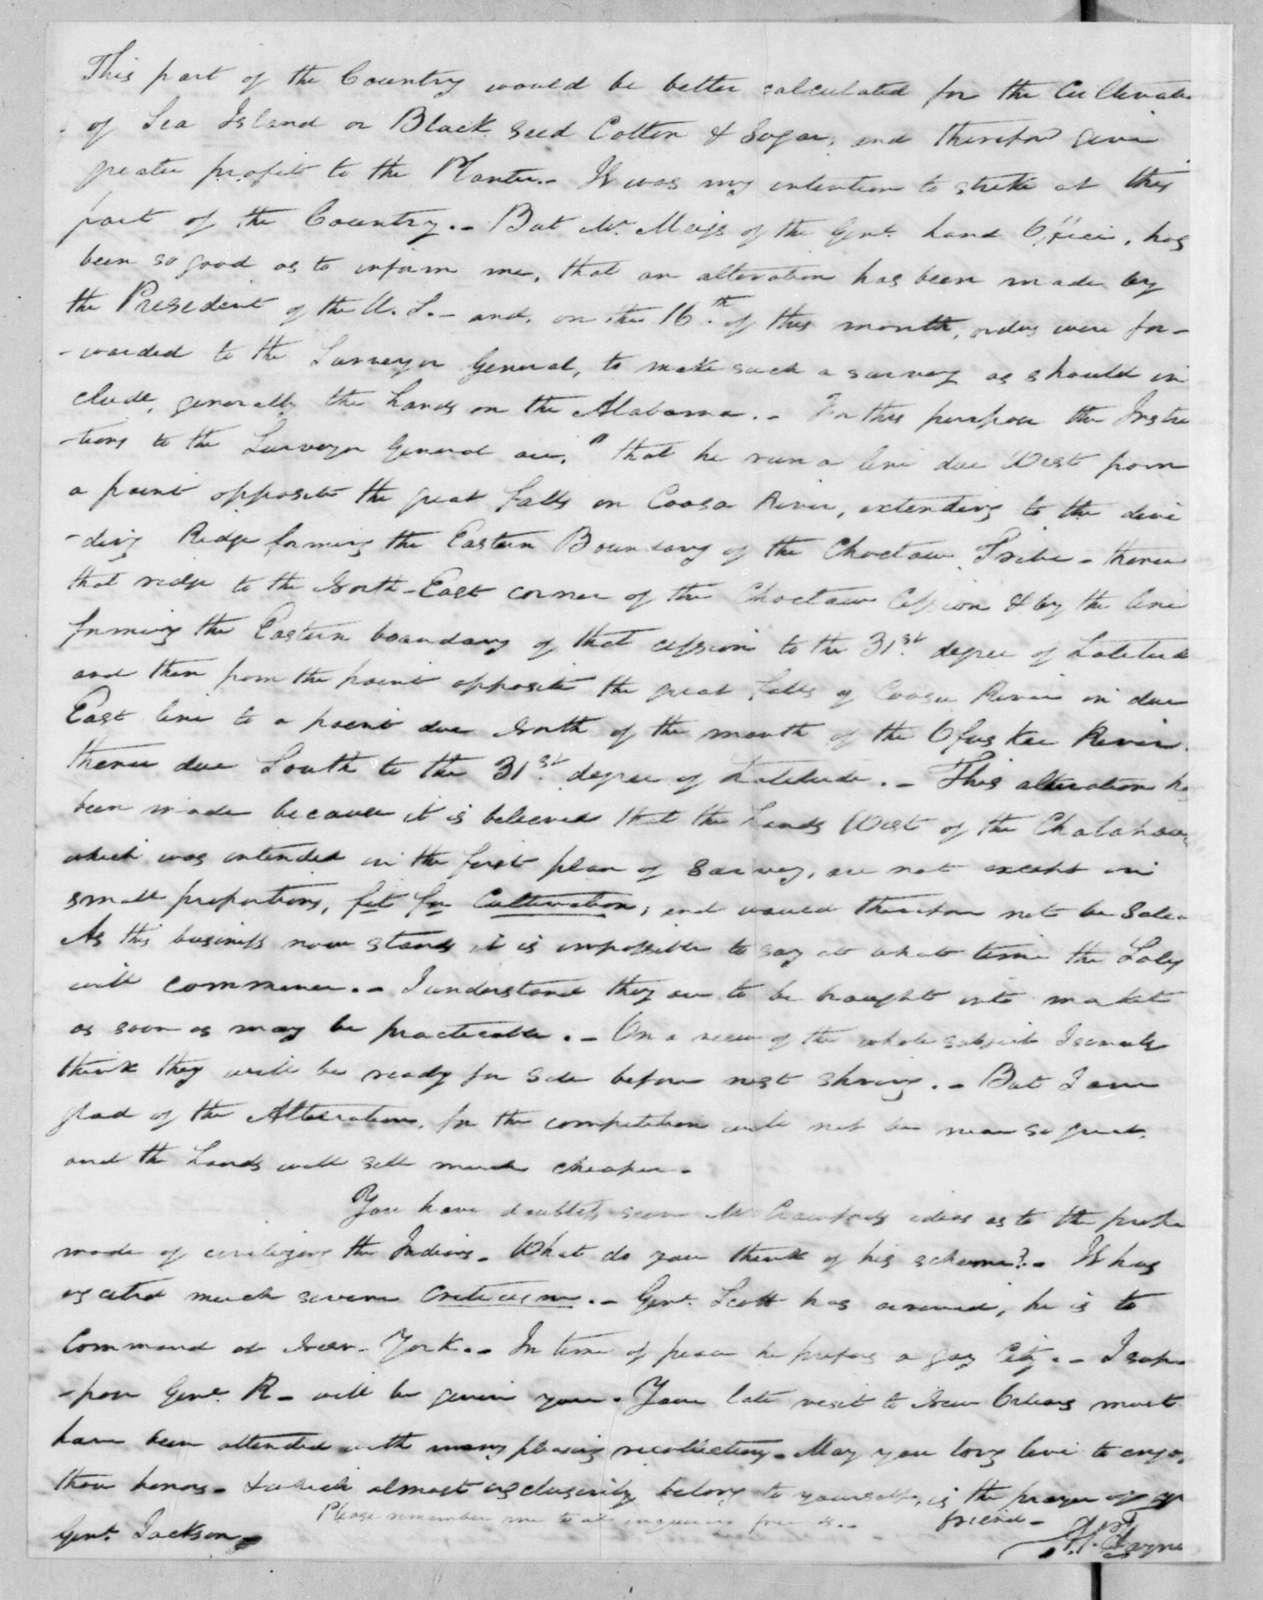 Arthur Peronneau Hayne to Andrew Jackson, May 31, 1816